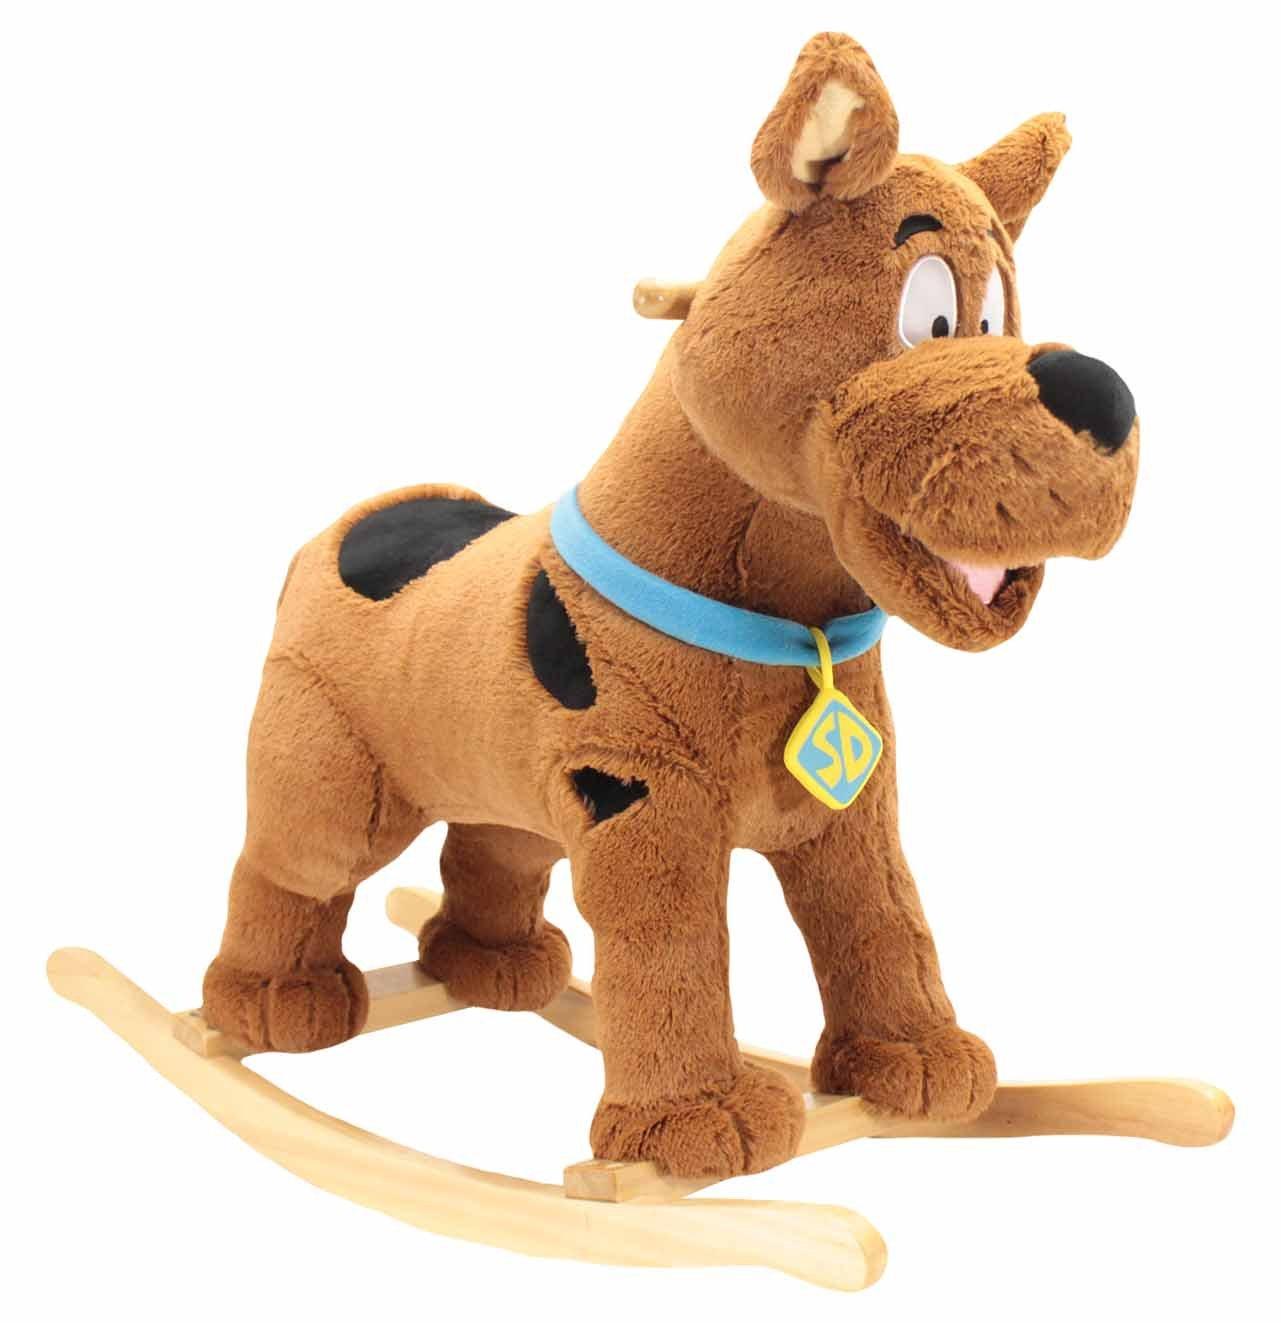 Animal Adventure Warner Brother's Scooby Doo Rocker Ride-on, Brown, 28'' x 12'' x 22''